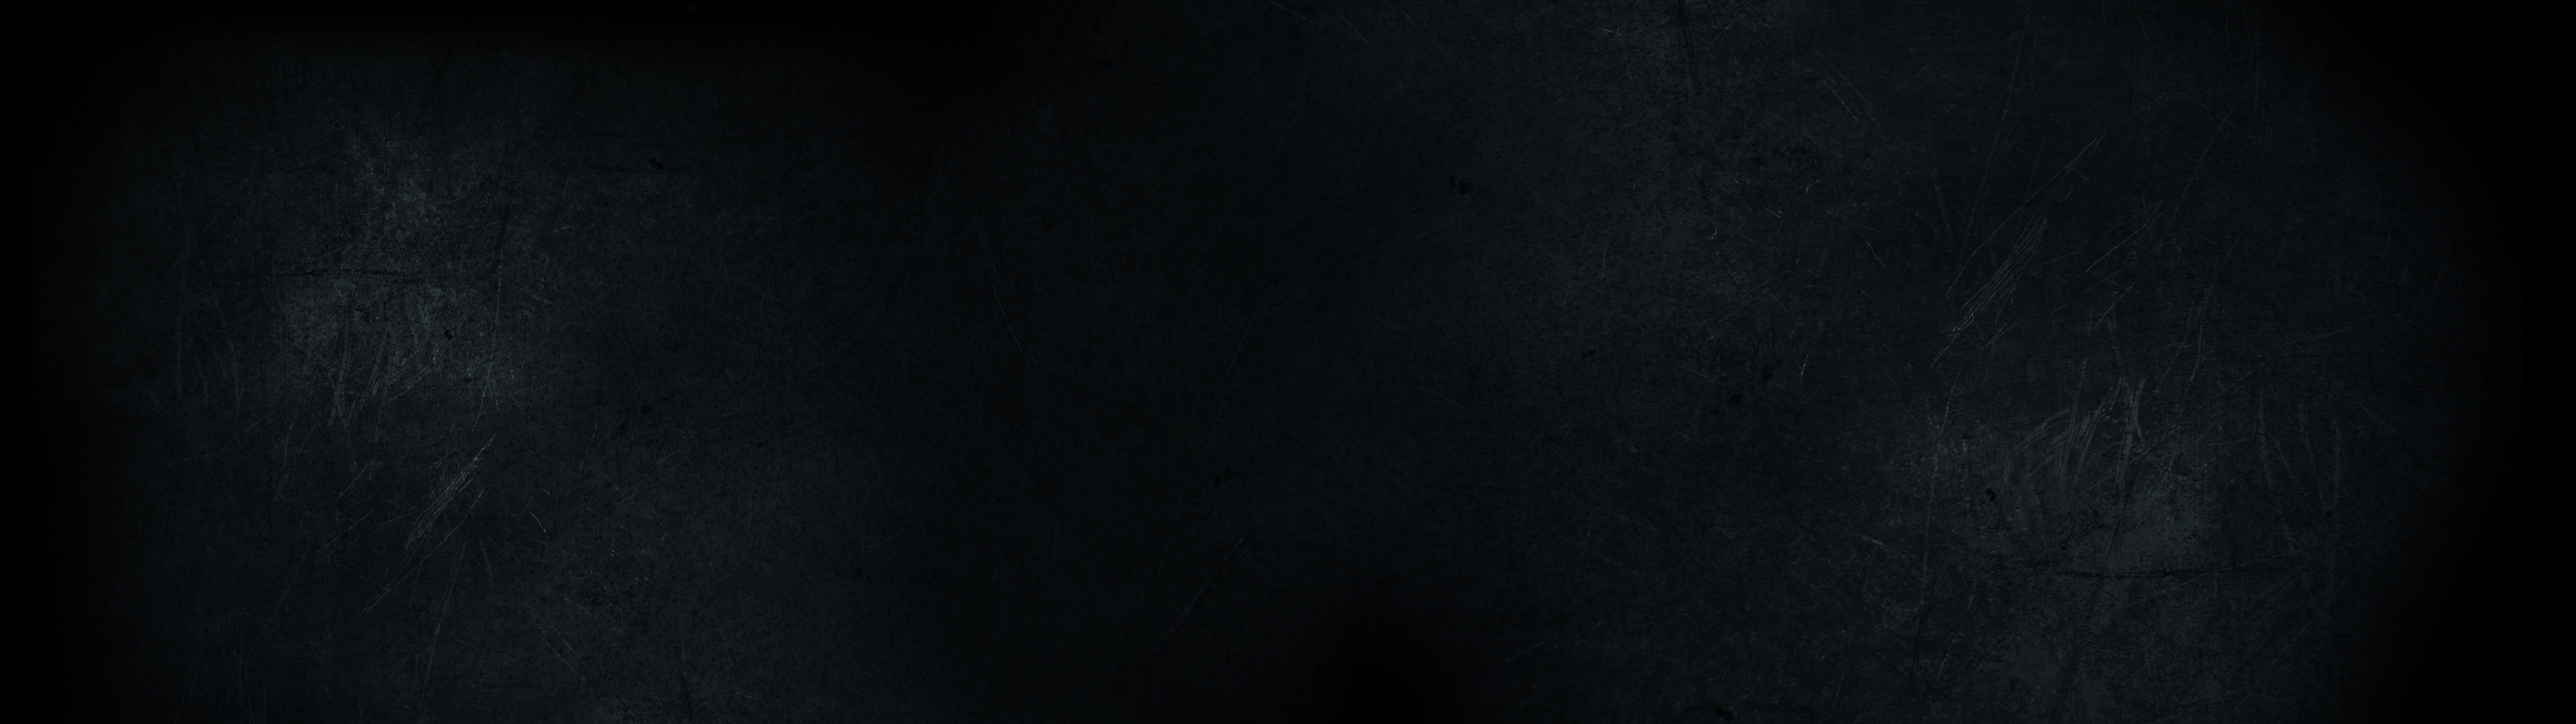 black apple wallpaper iphone x